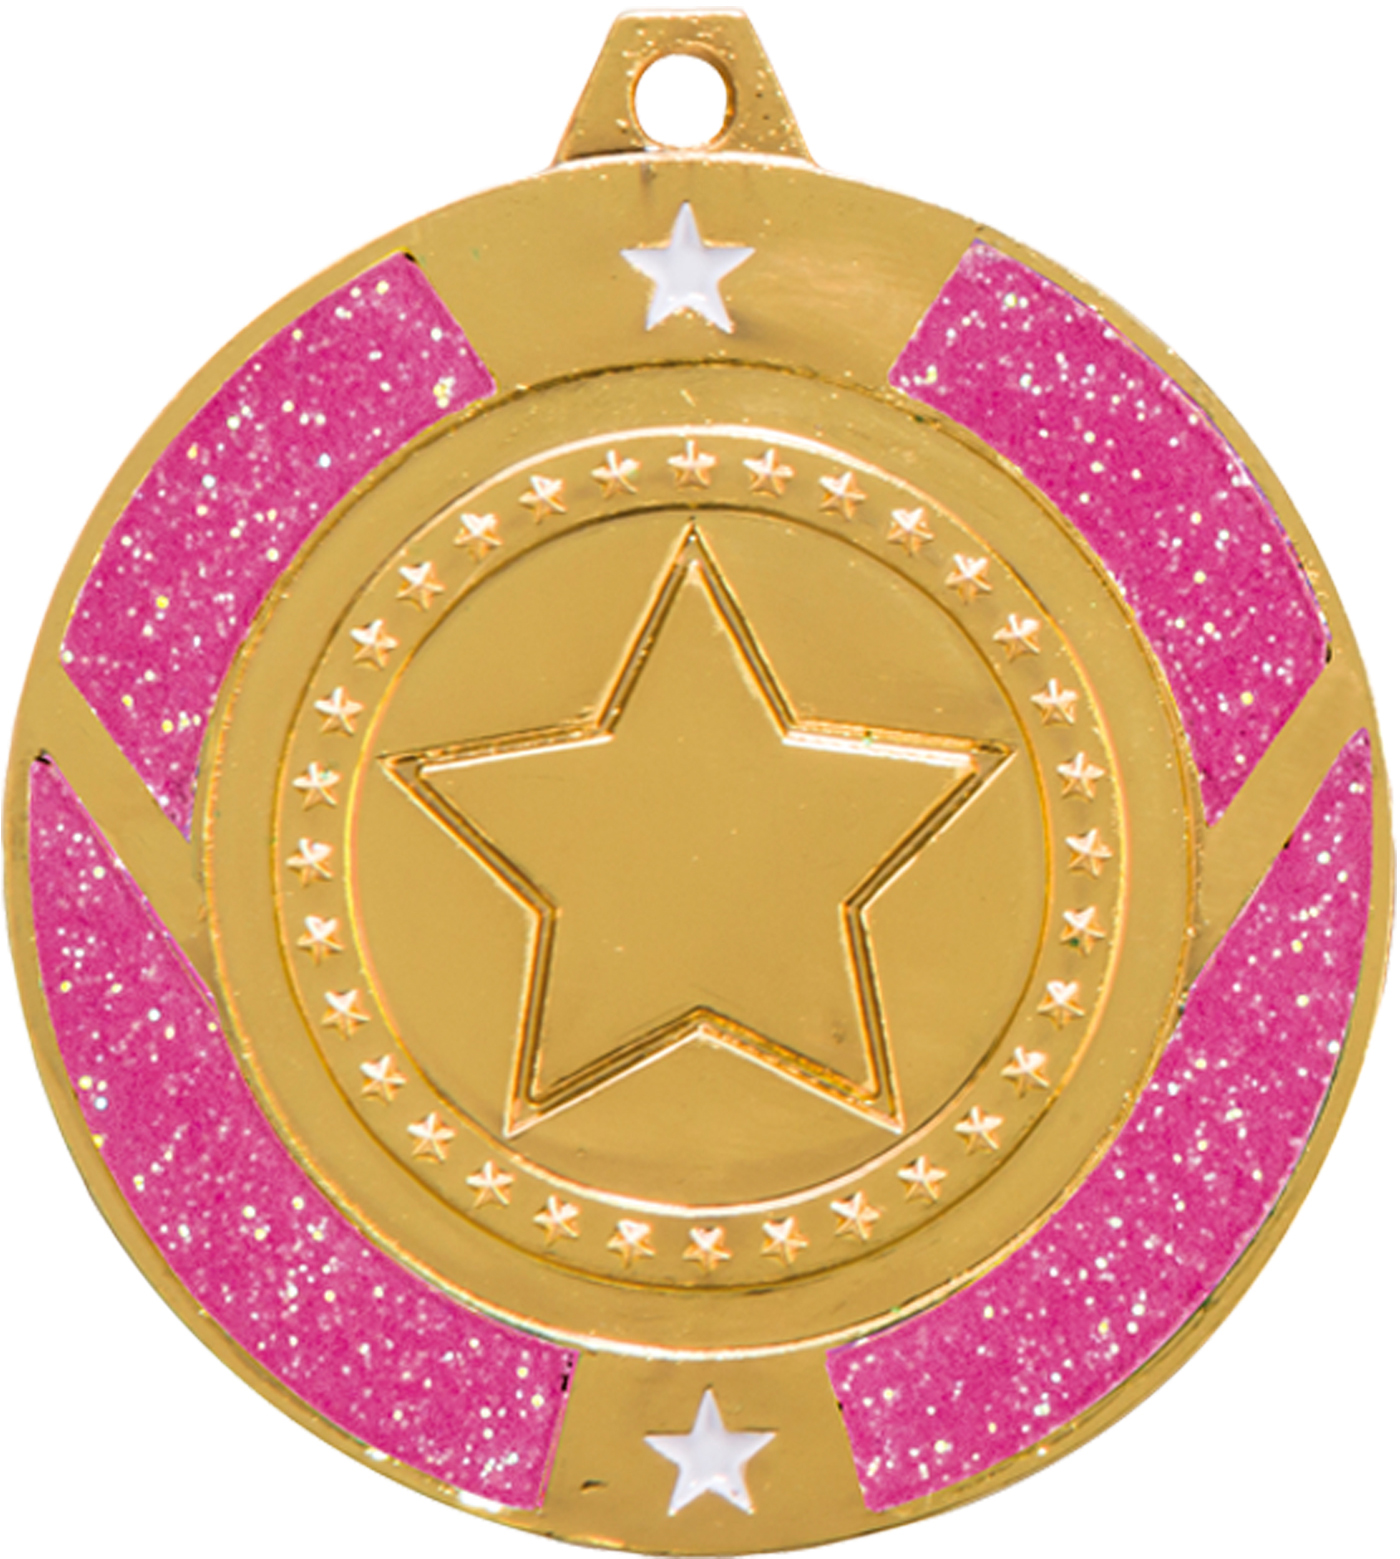 "Gold & Pink Glitter Star Medal 5cm (2"")"